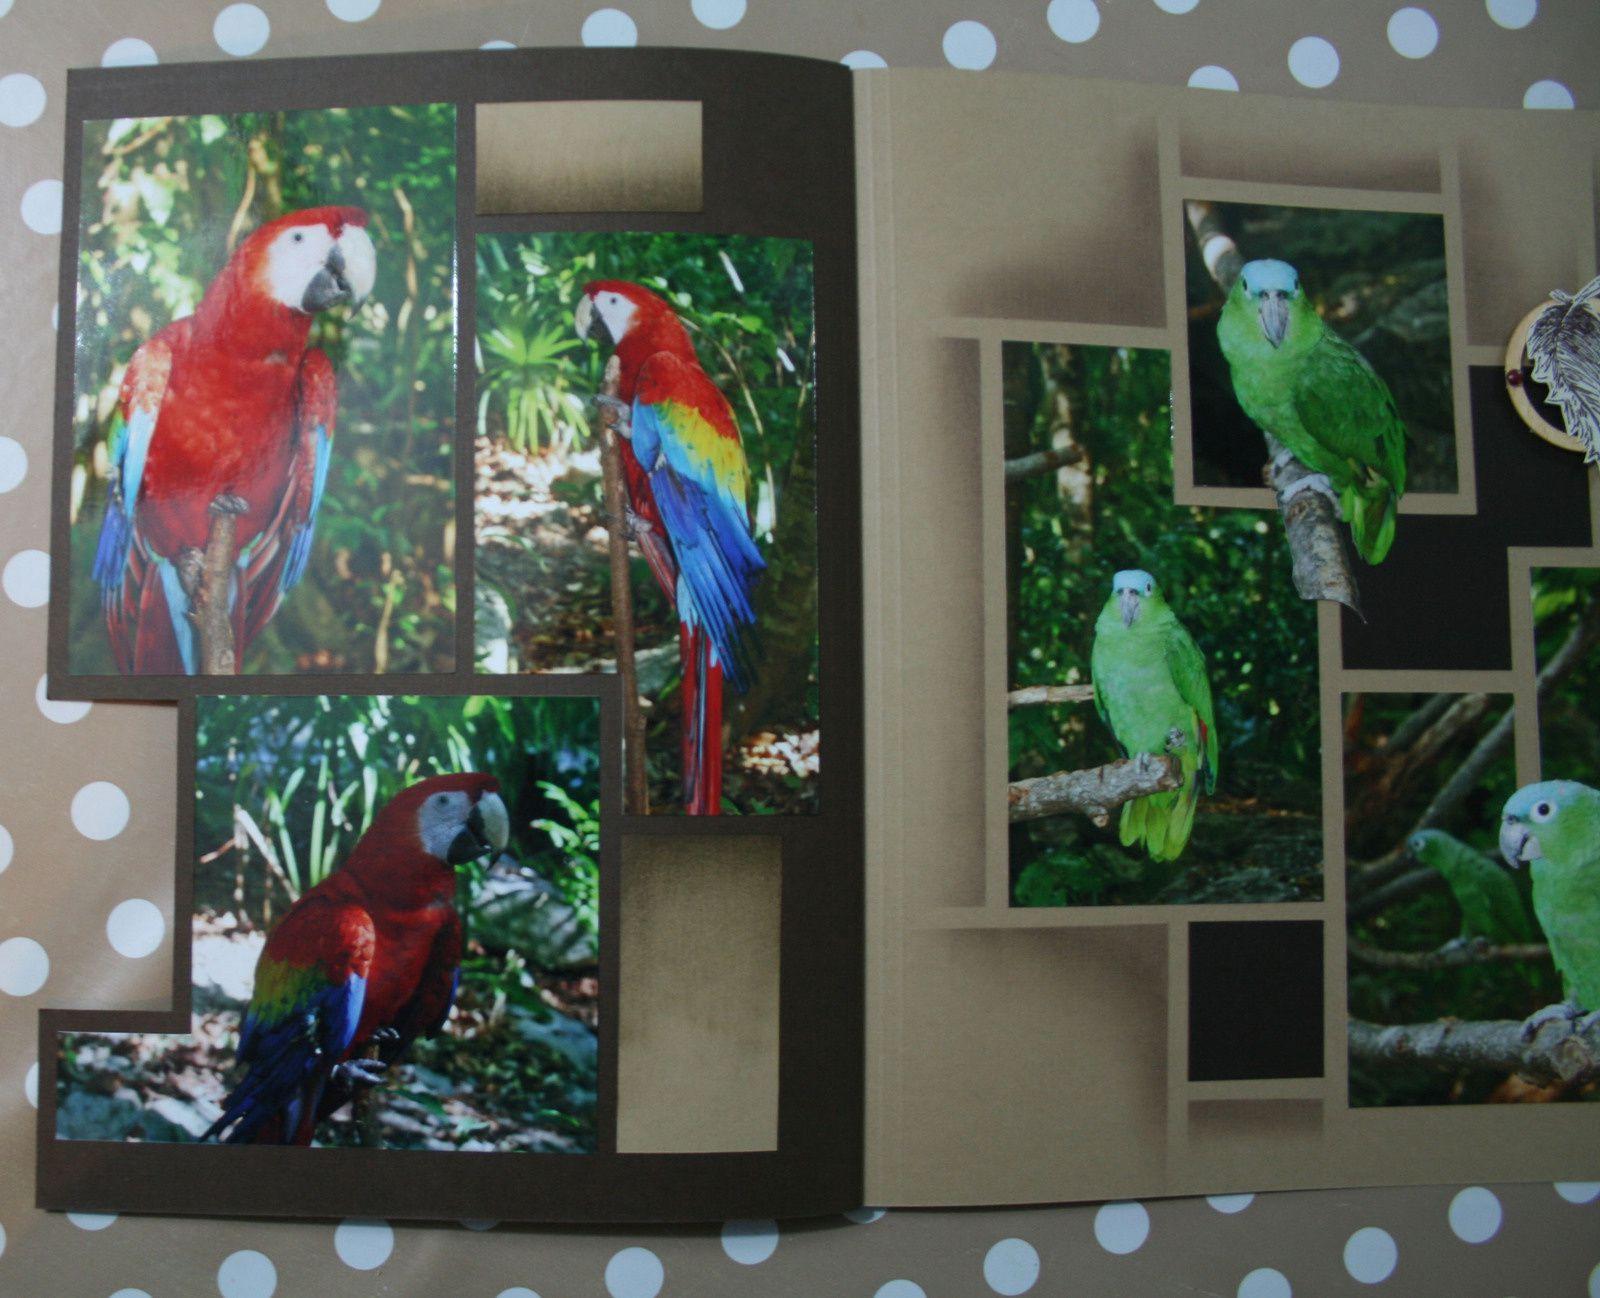 Aviario-bird Sanctuary